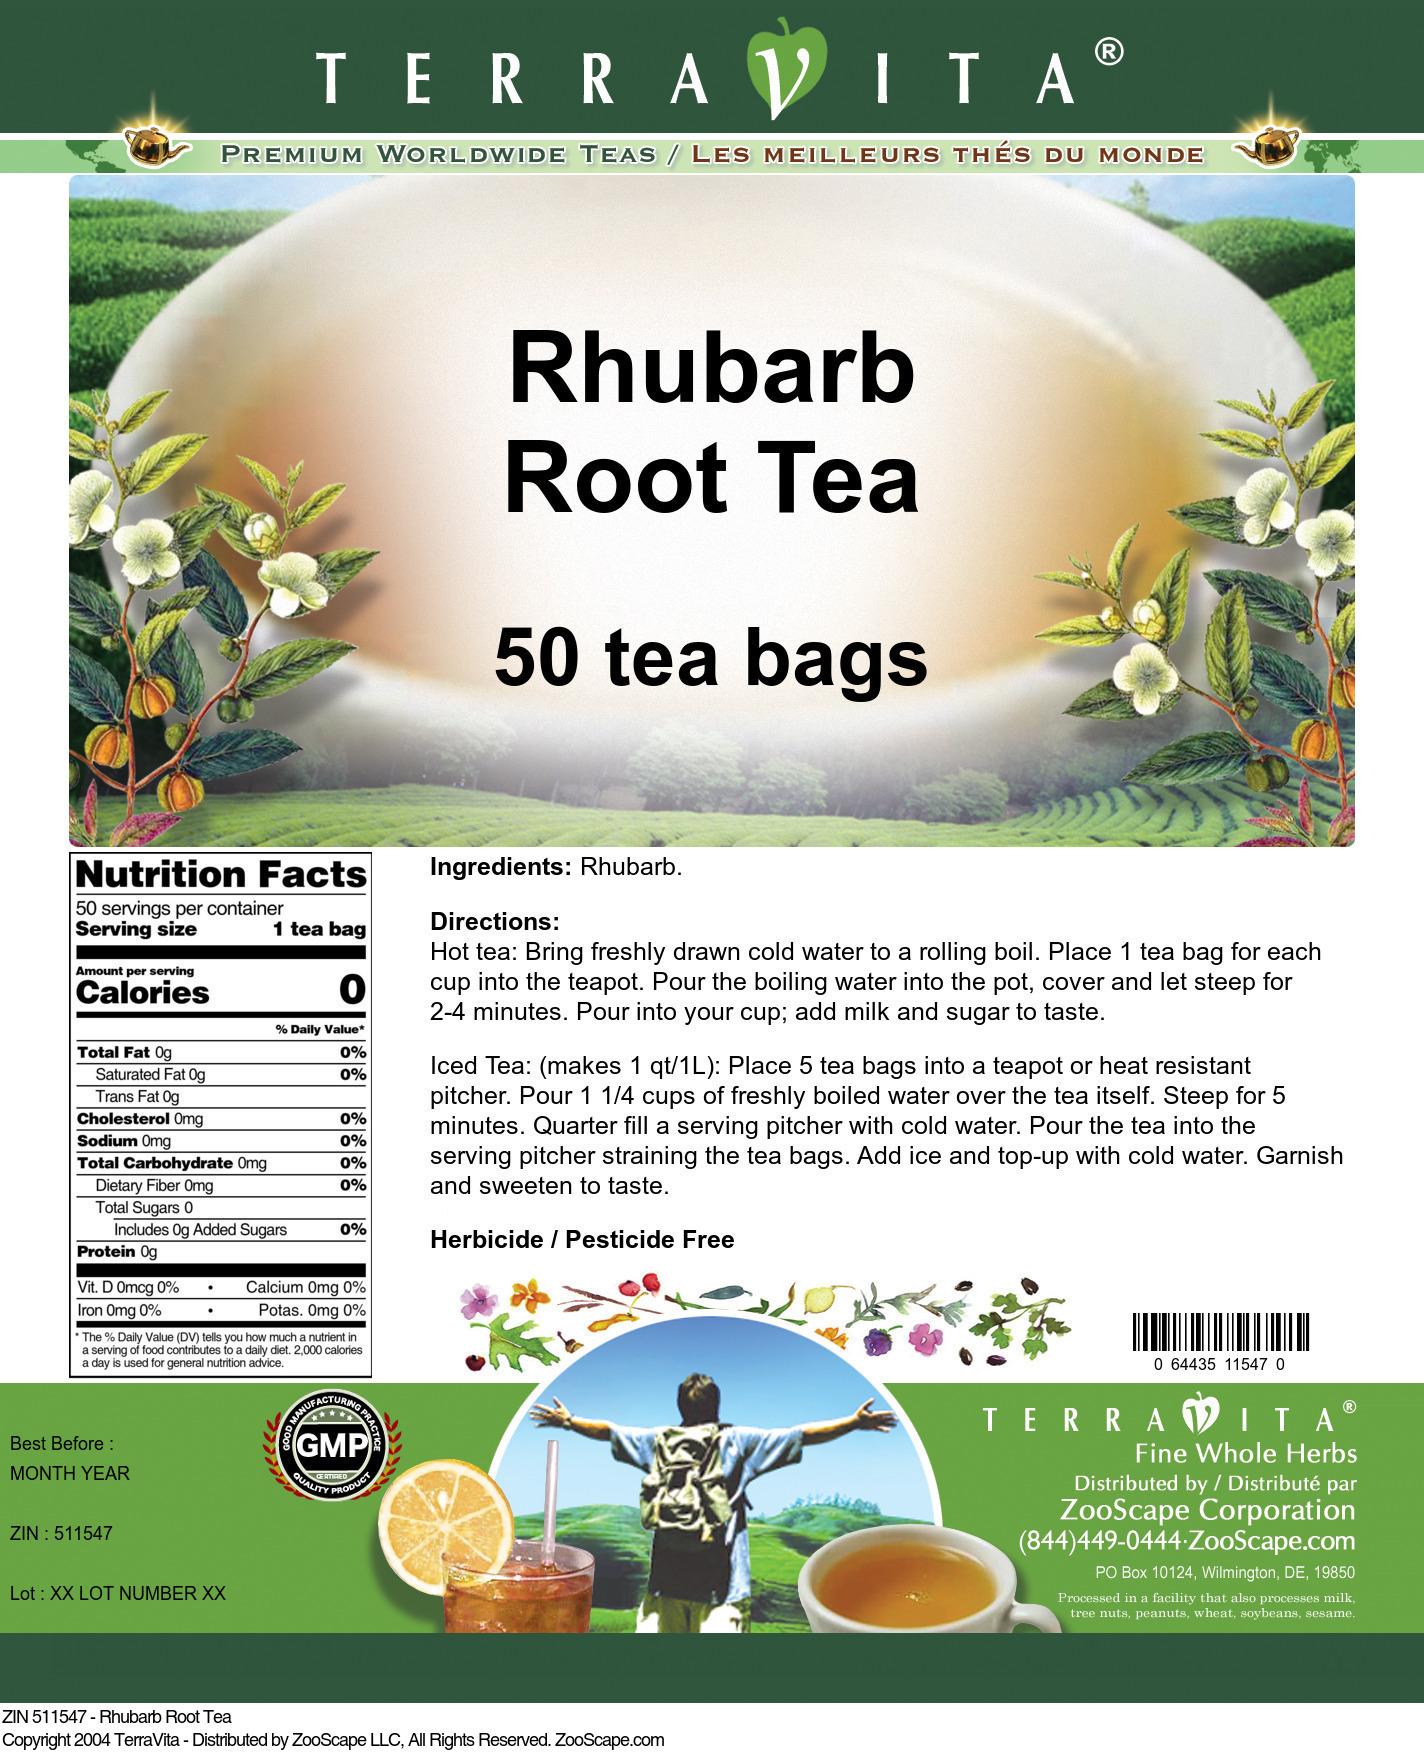 Rhubarb Root Tea